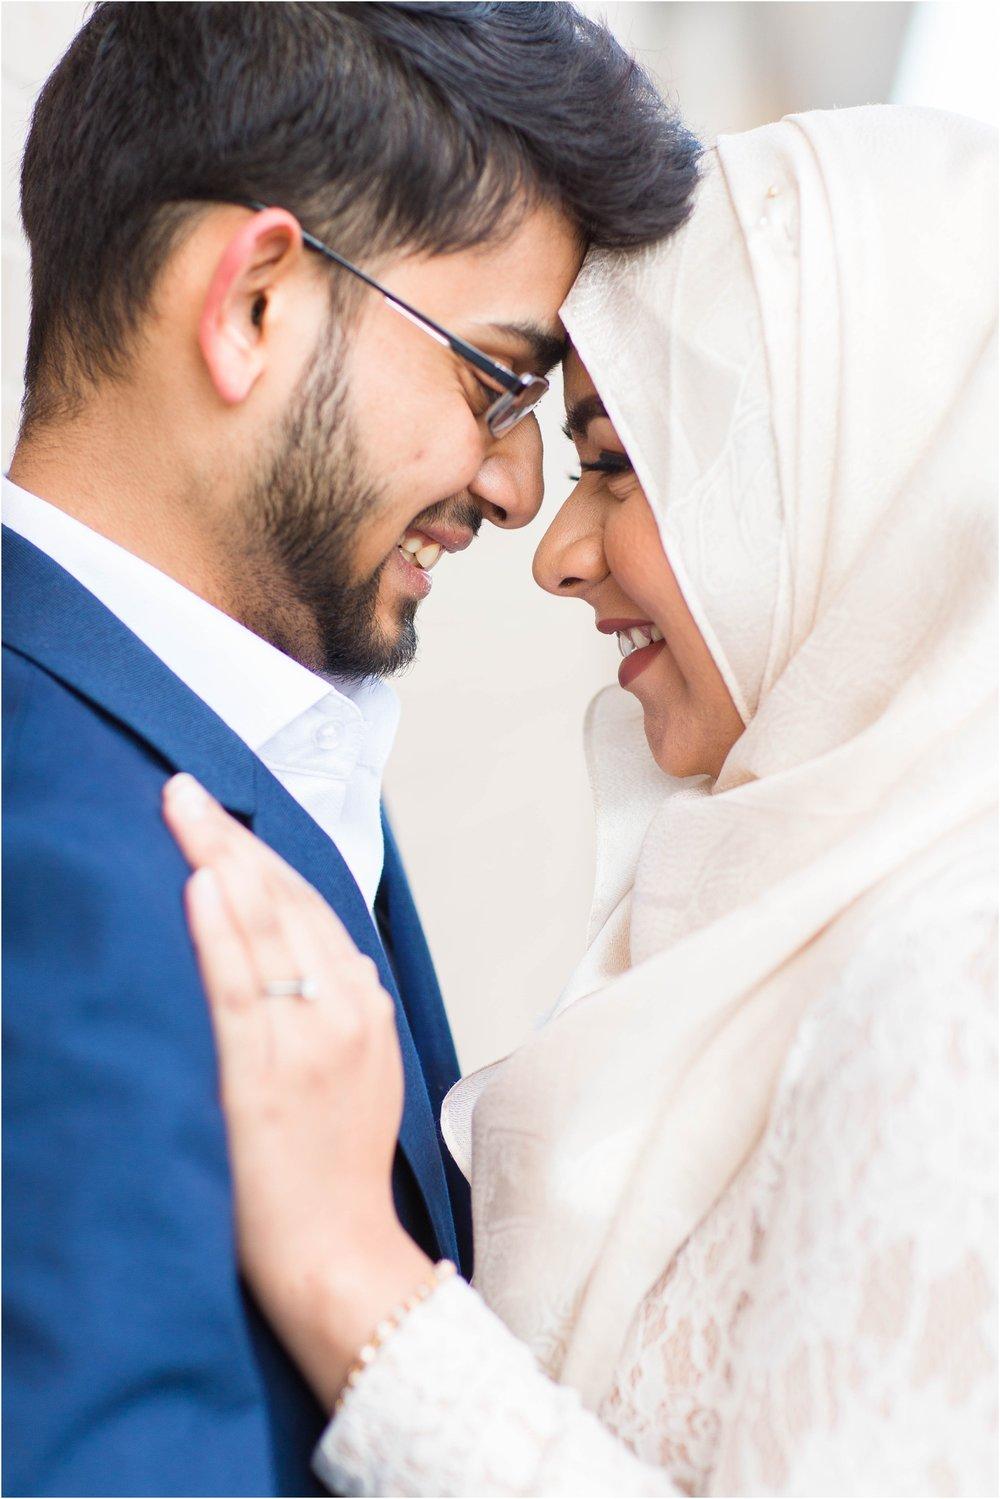 Shops-at-Don-Mills-Engagement-Session-Toronto-Mississauga-Brampton-Scarborough-GTA-Pakistani-Indian-Wedding-Engagement-Photographer-Photography_0006.jpg